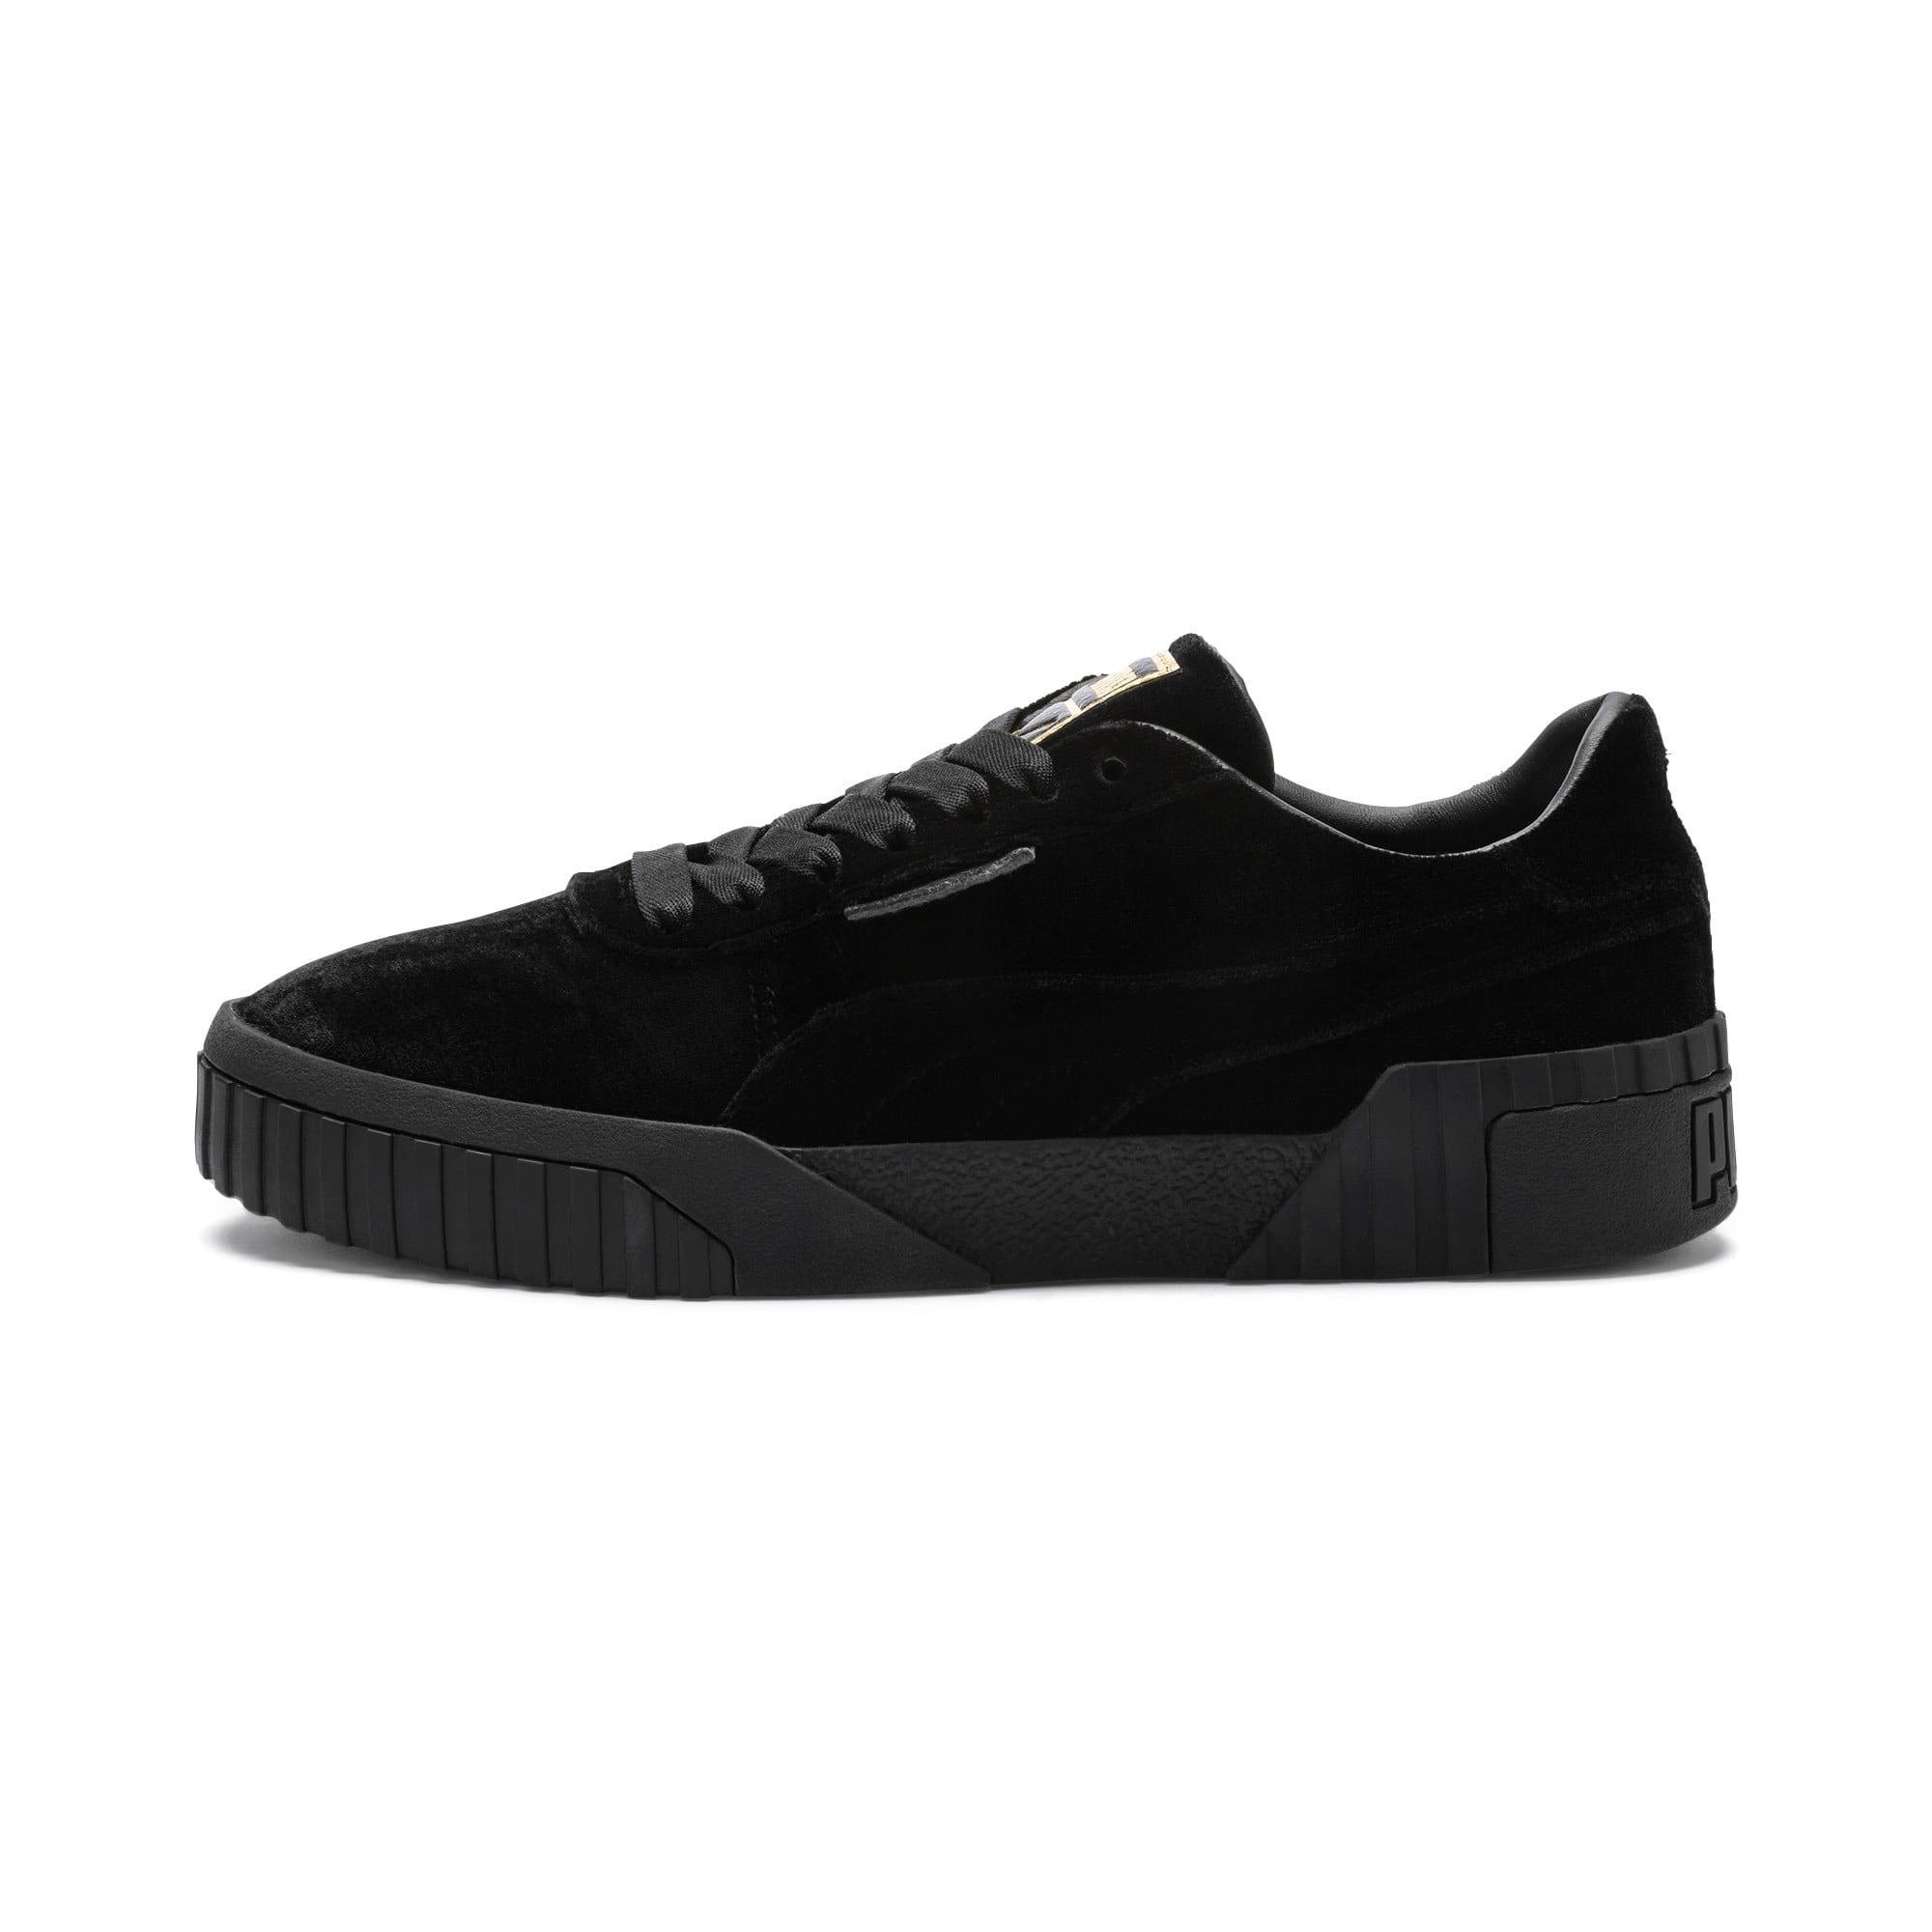 Thumbnail 1 of Cali Velvet Women's Sneakers, Puma Black-Puma Black, medium